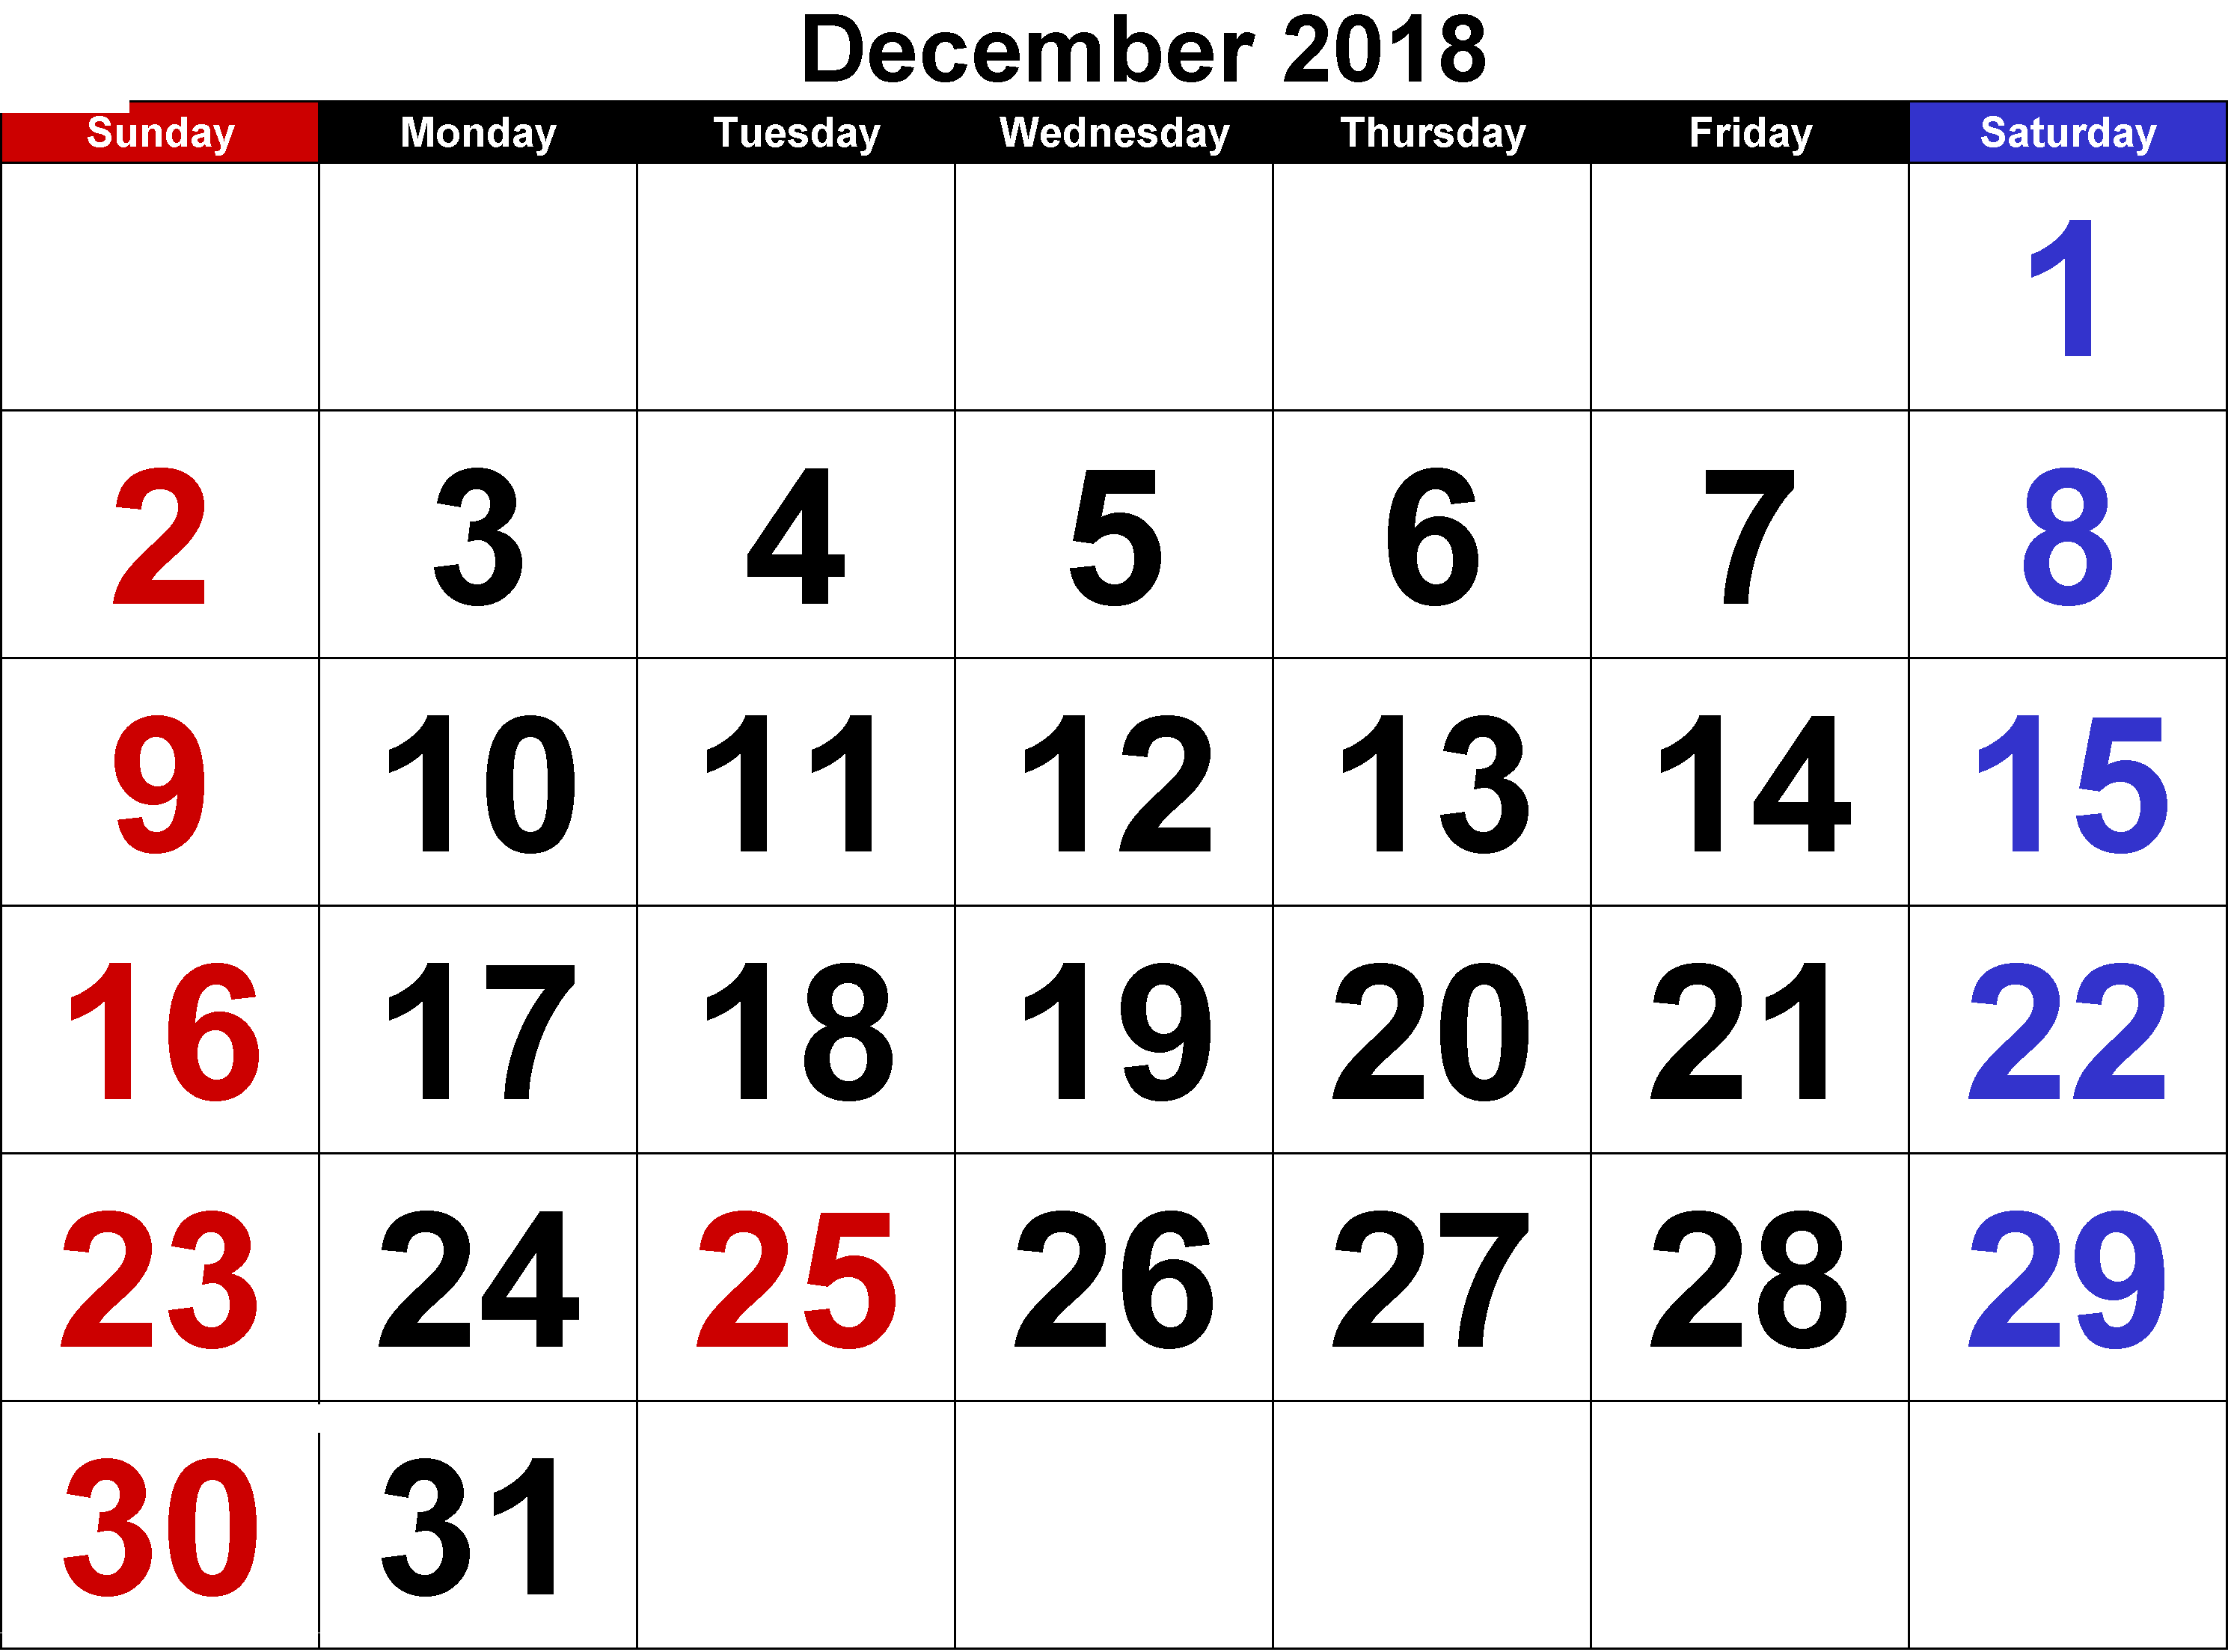 December 2018 Calendar South Africa Printable